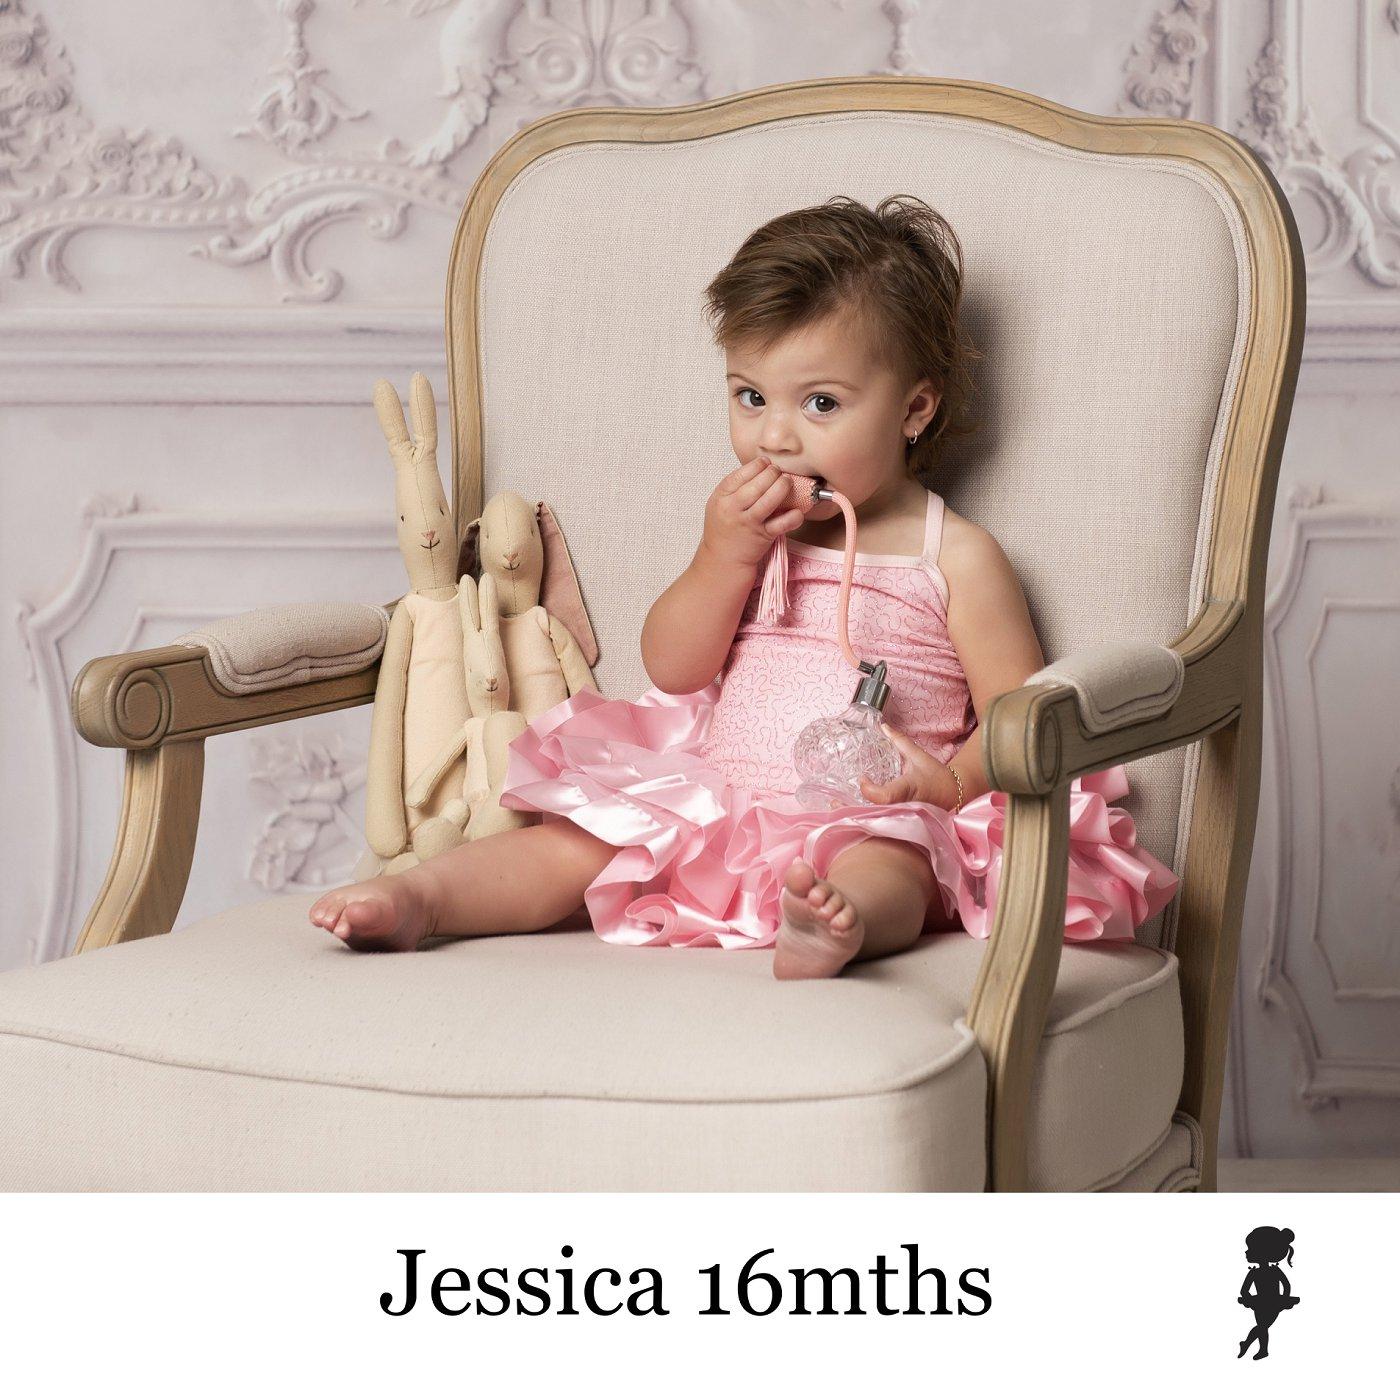 LB10119- Jessica 16 months.jpg